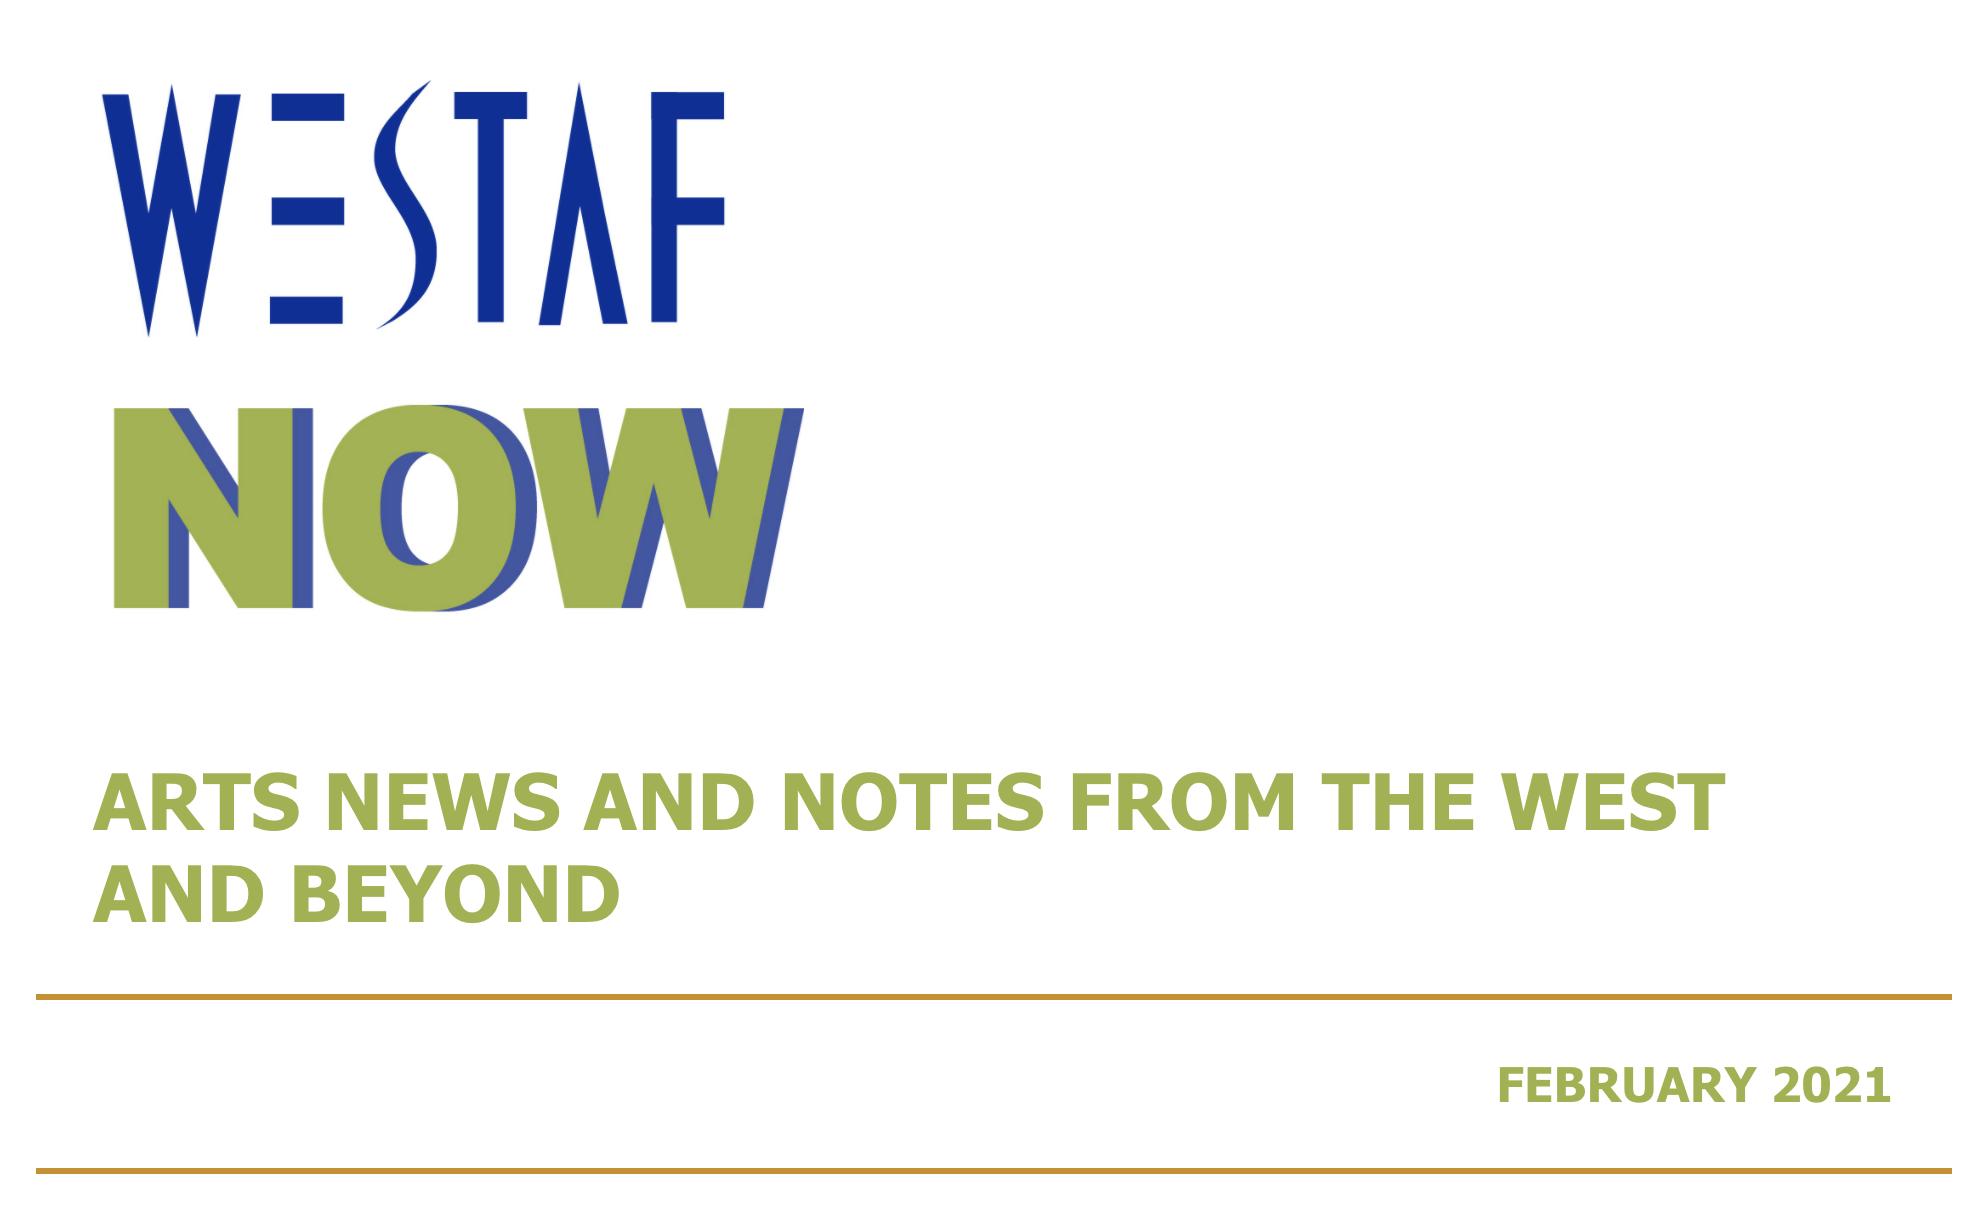 WESTAF Now Newsletter - February 2021